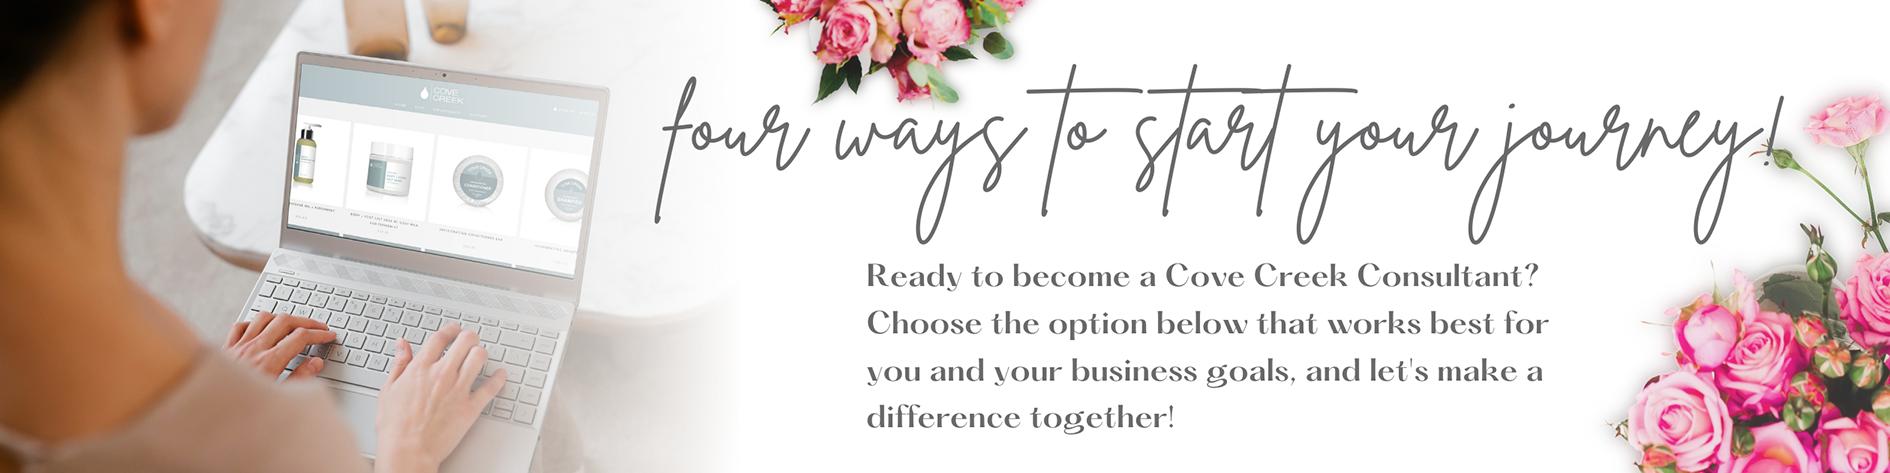 4 Ways To Get Started